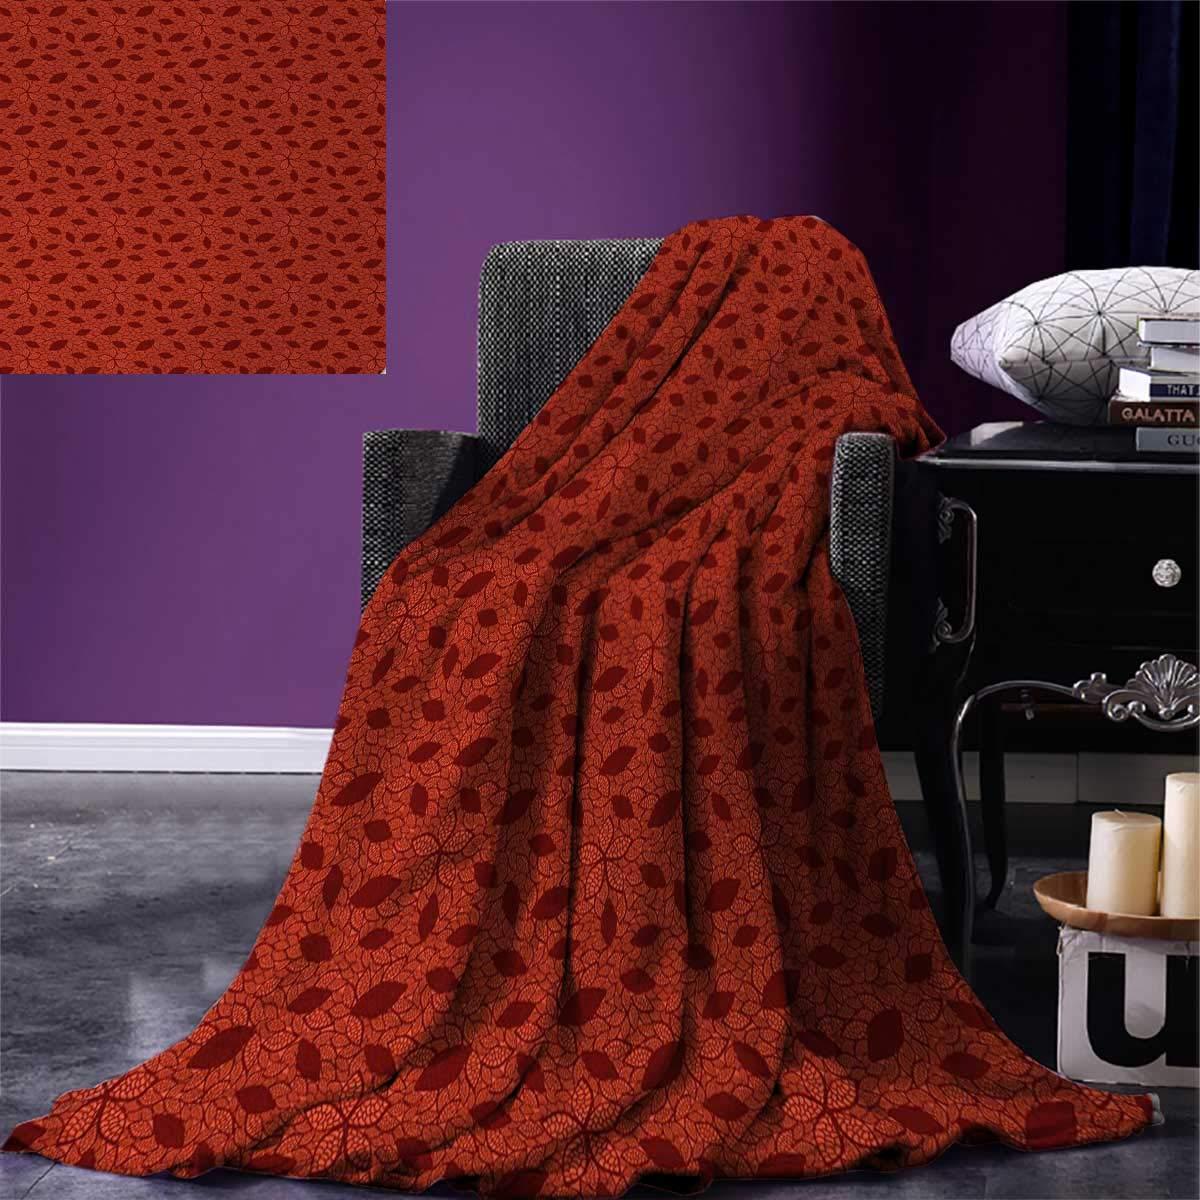 Amazon Burnt Orange Throw Blanket Leafage Pattern With